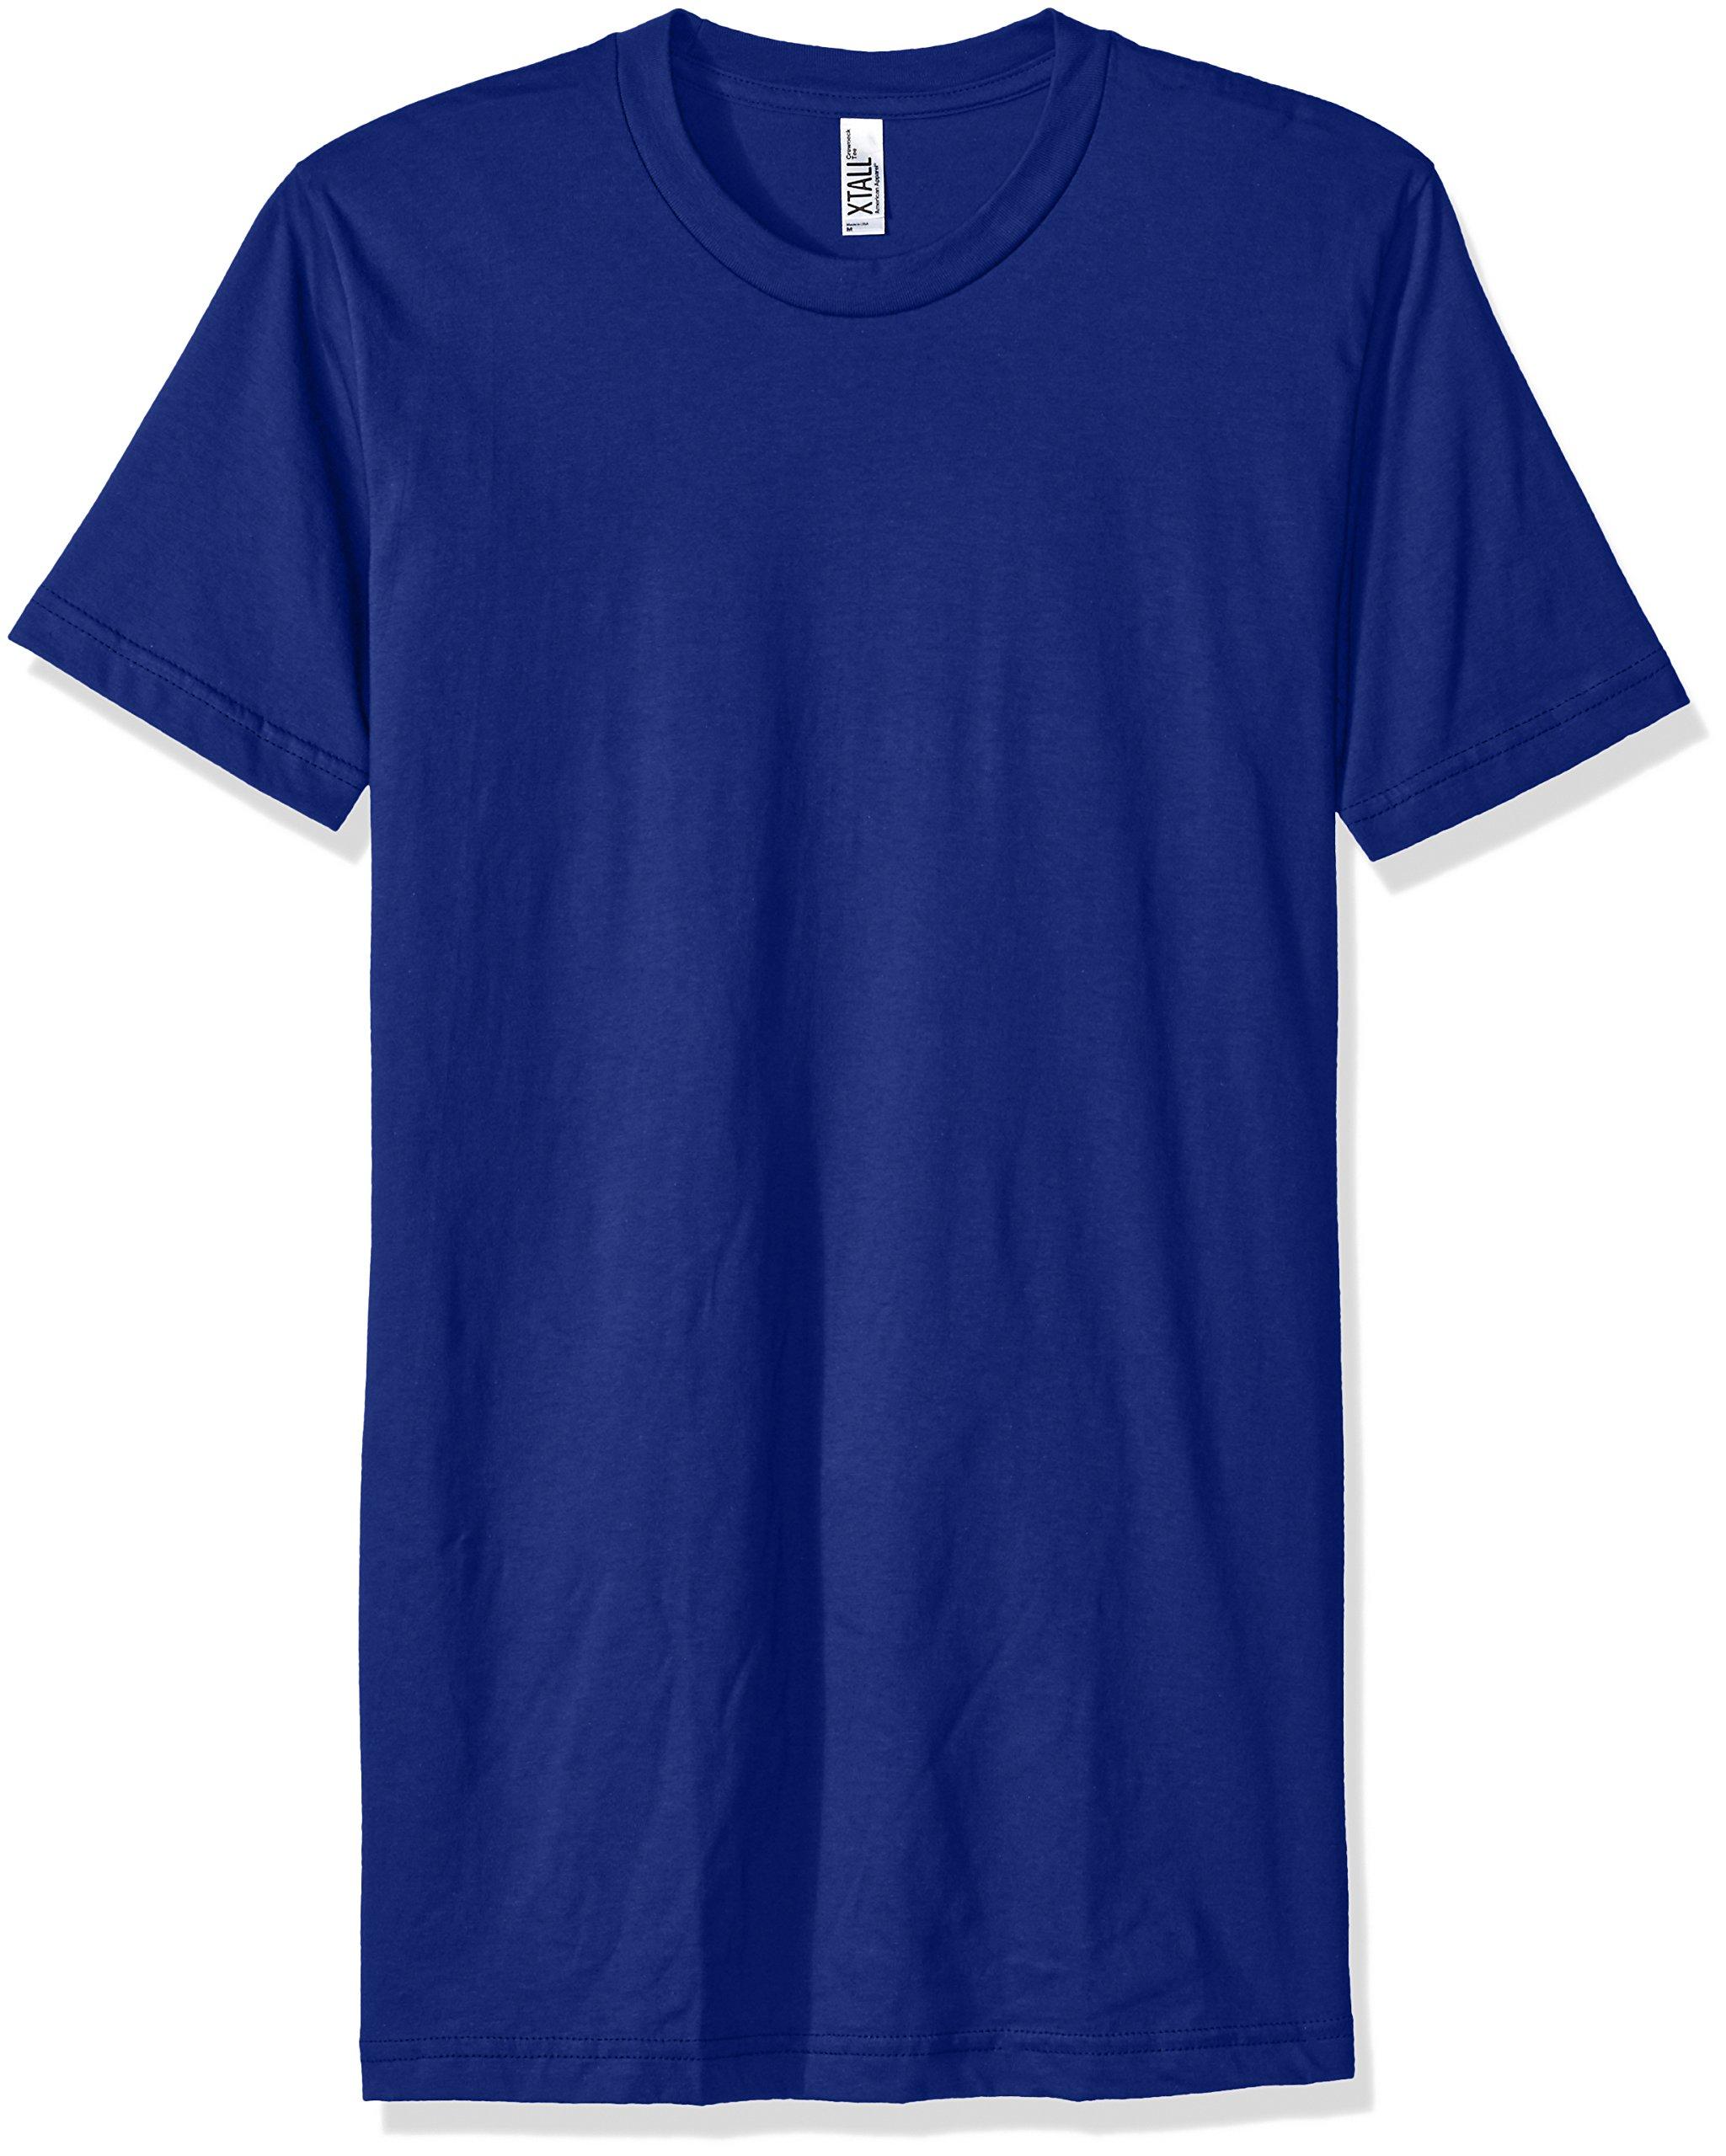 American Apparel Men's Fine Jersey Short Sleeve Tall Tee, Lapis, Medium